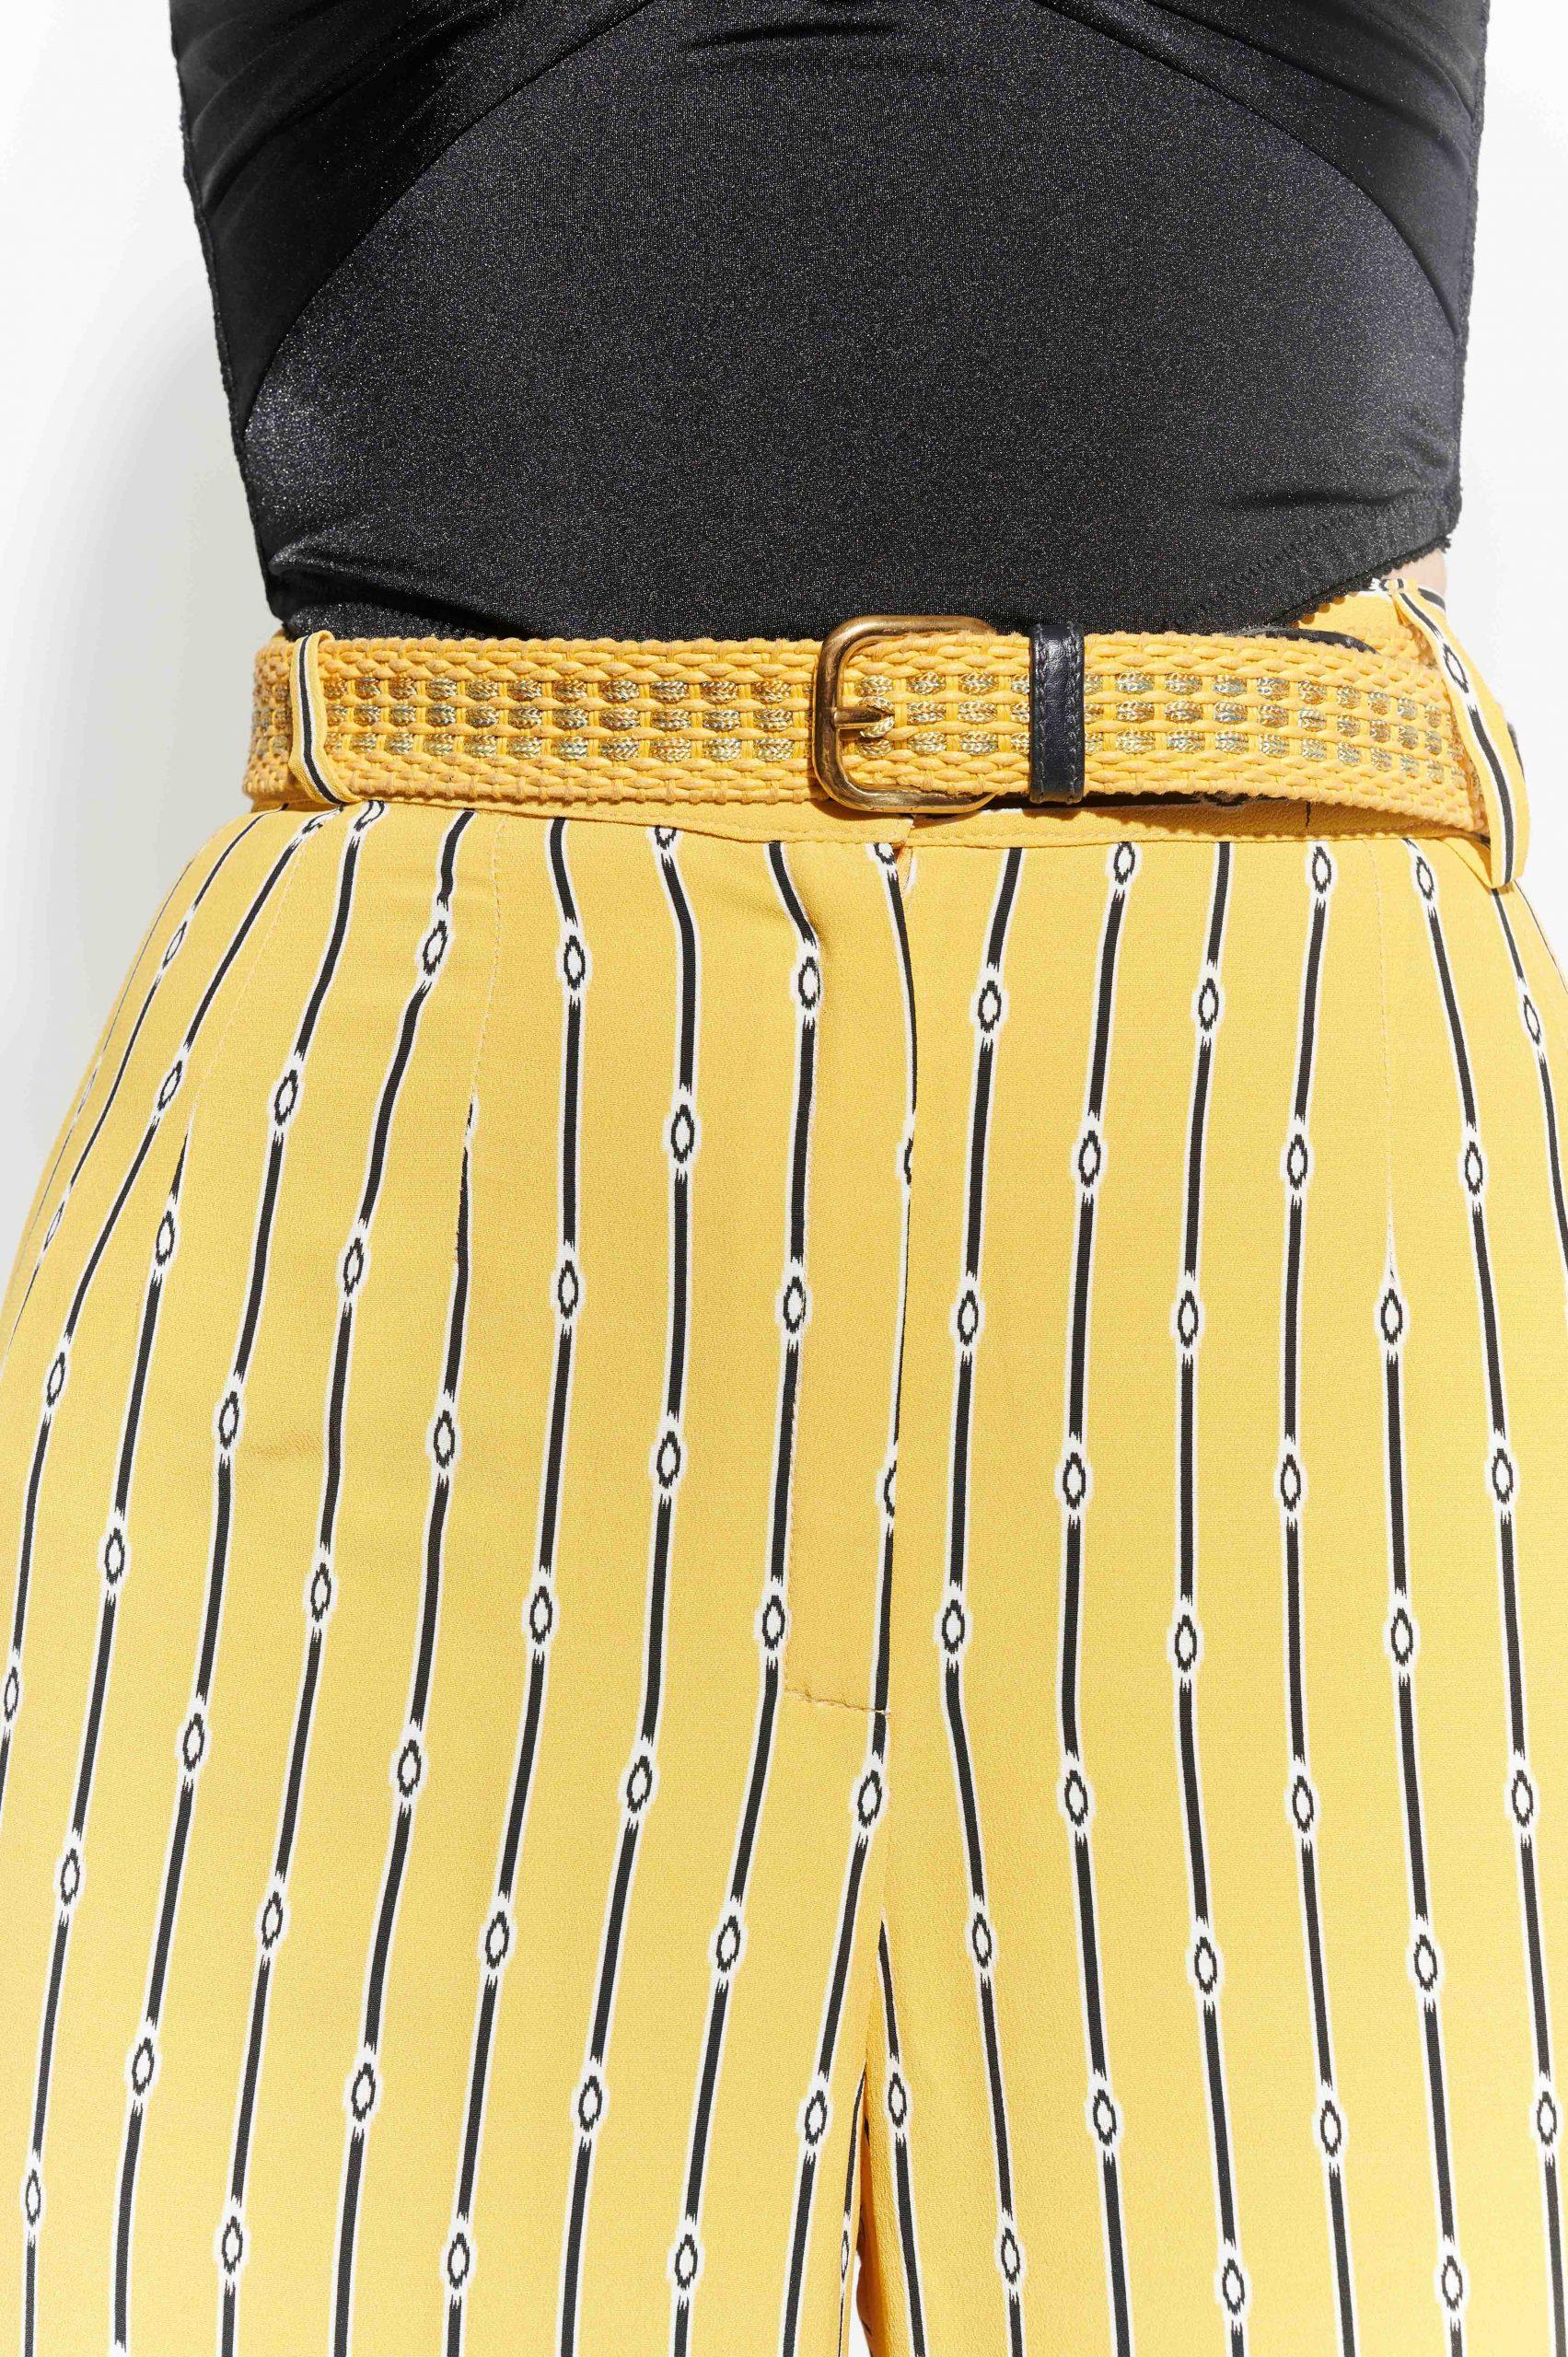 90'lar Lanvin marka sarı lacivert kemer